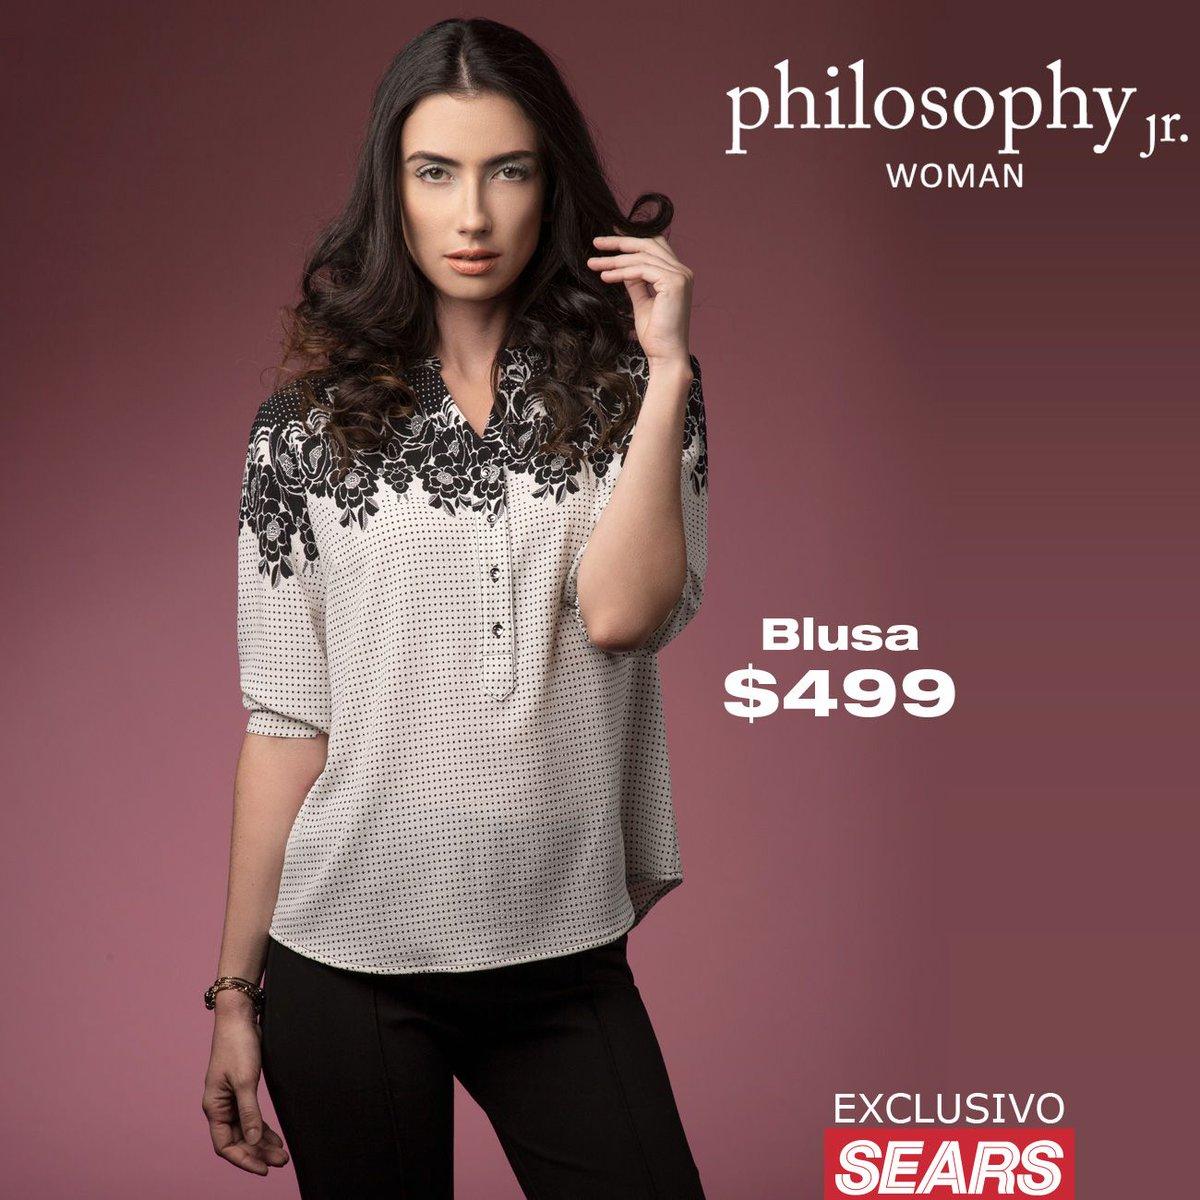 bab636129  PhilosophyJrstudio hashtag on Twitter